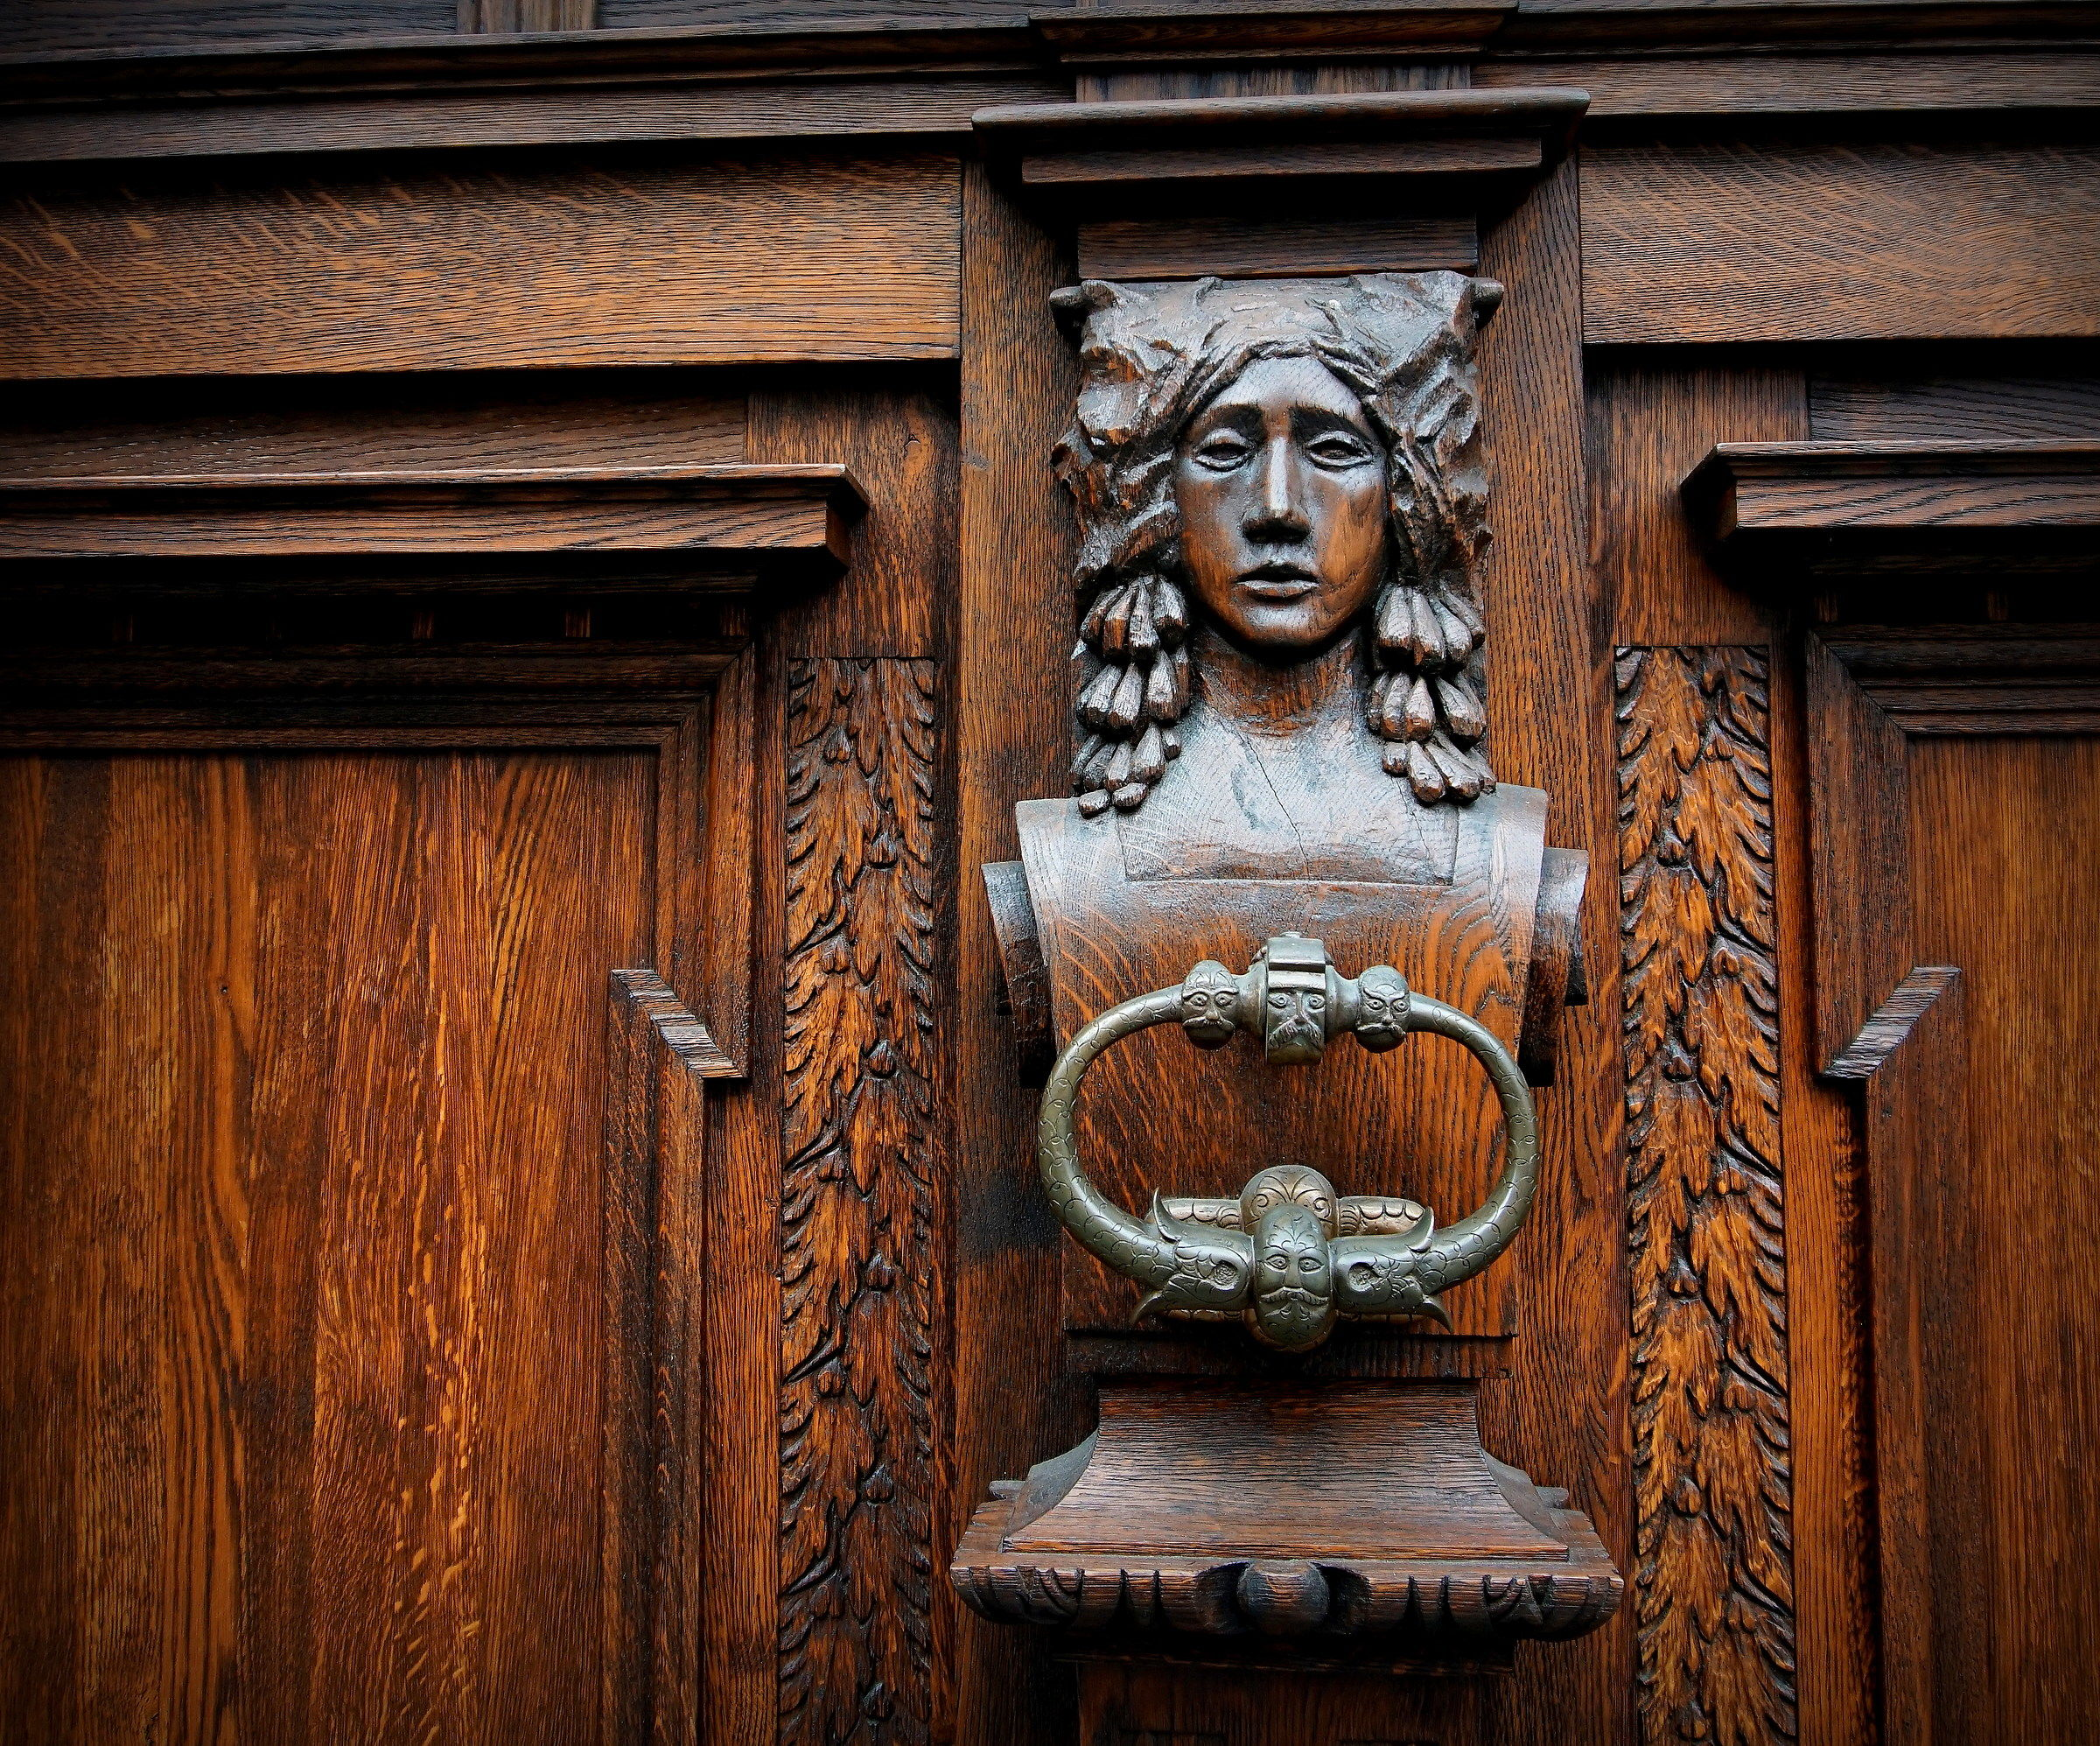 Doornocker, (in the city of Krumlov)...